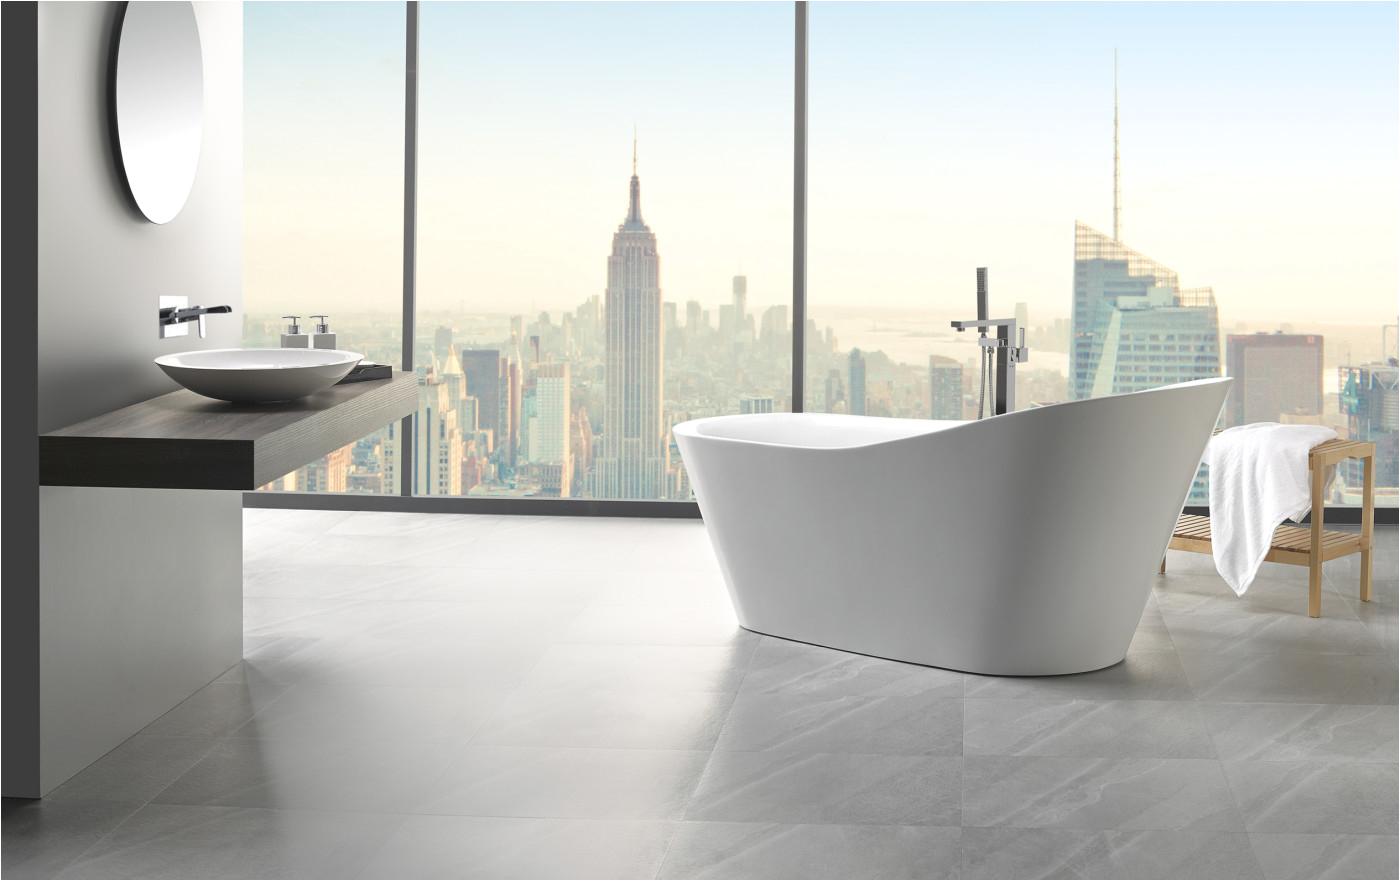 5 Ft Freestanding Bathtub Arges 5 9 Ft Reversible Drain Freestanding Bathtub In